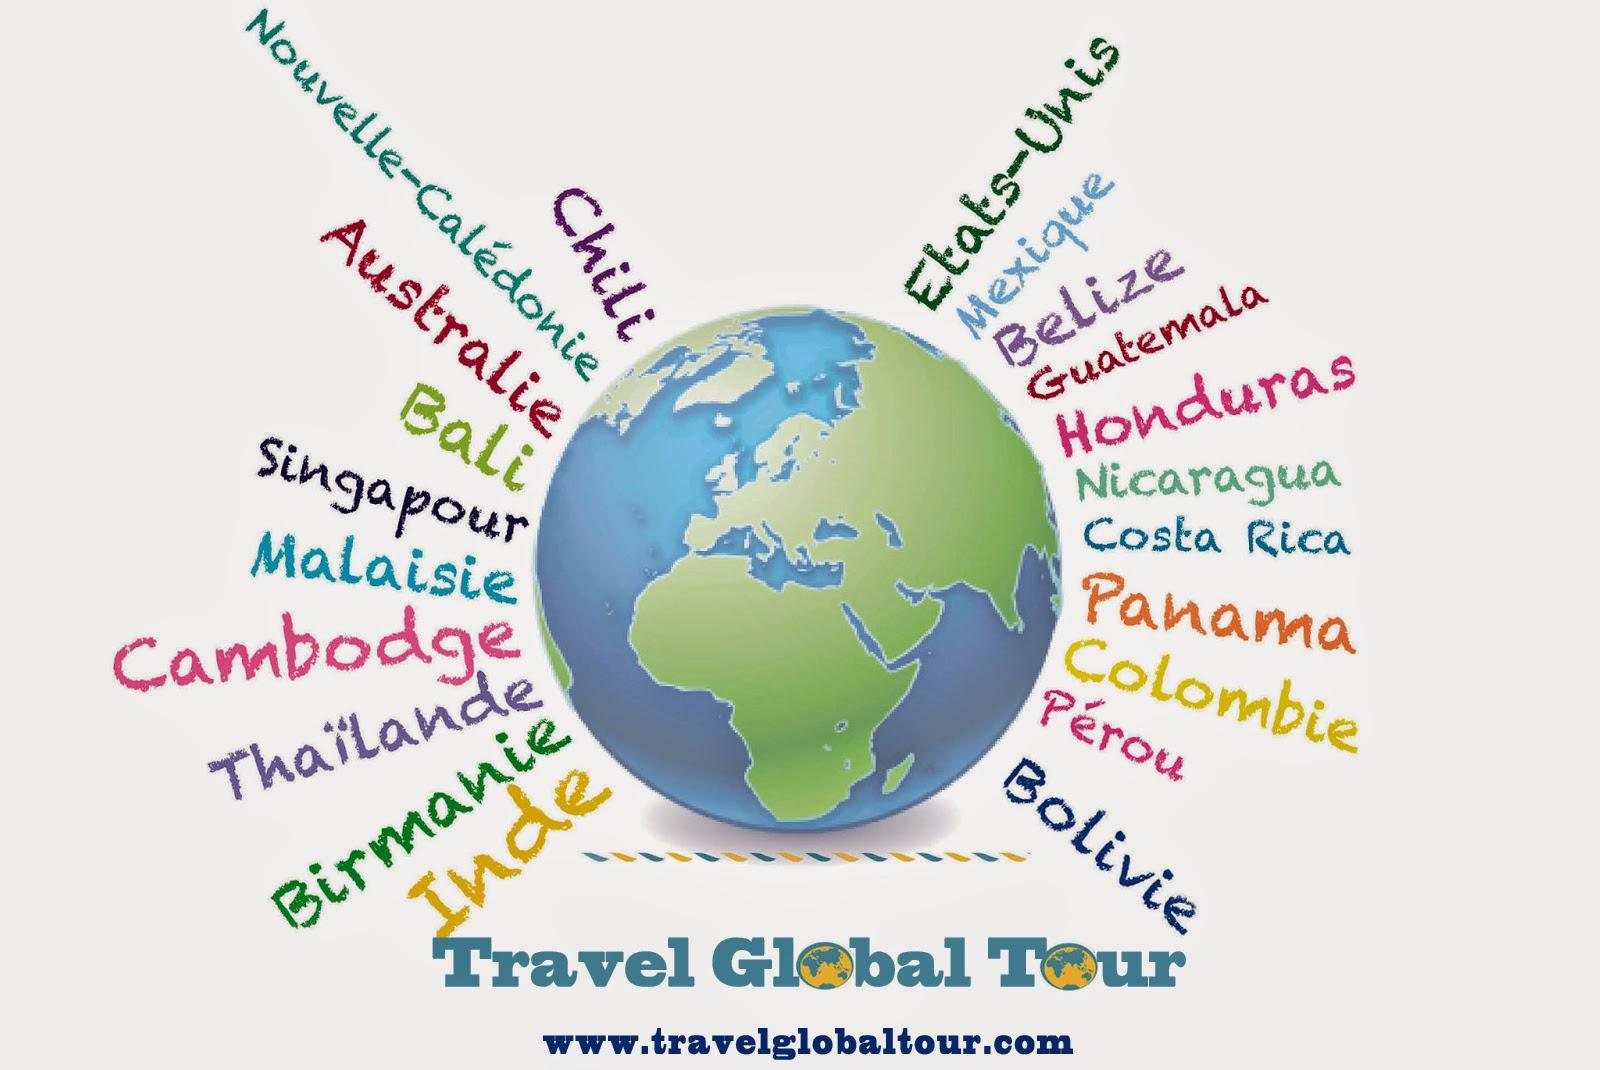 travel global tour